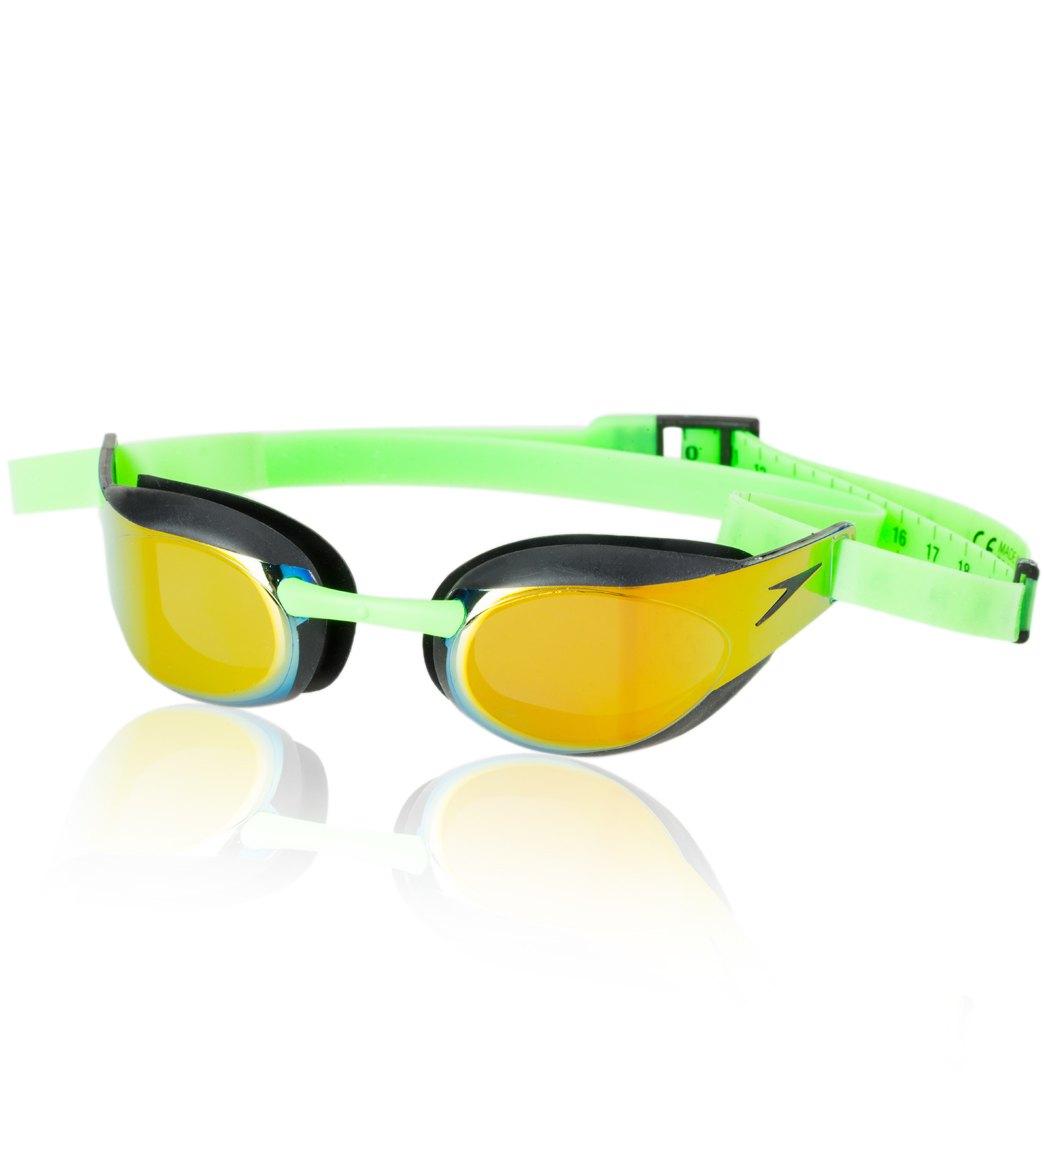 Speedo Fastskin3 Elite Mirrored Goggle at SwimOutlet.com - Free Shipping 6df14460c9c0